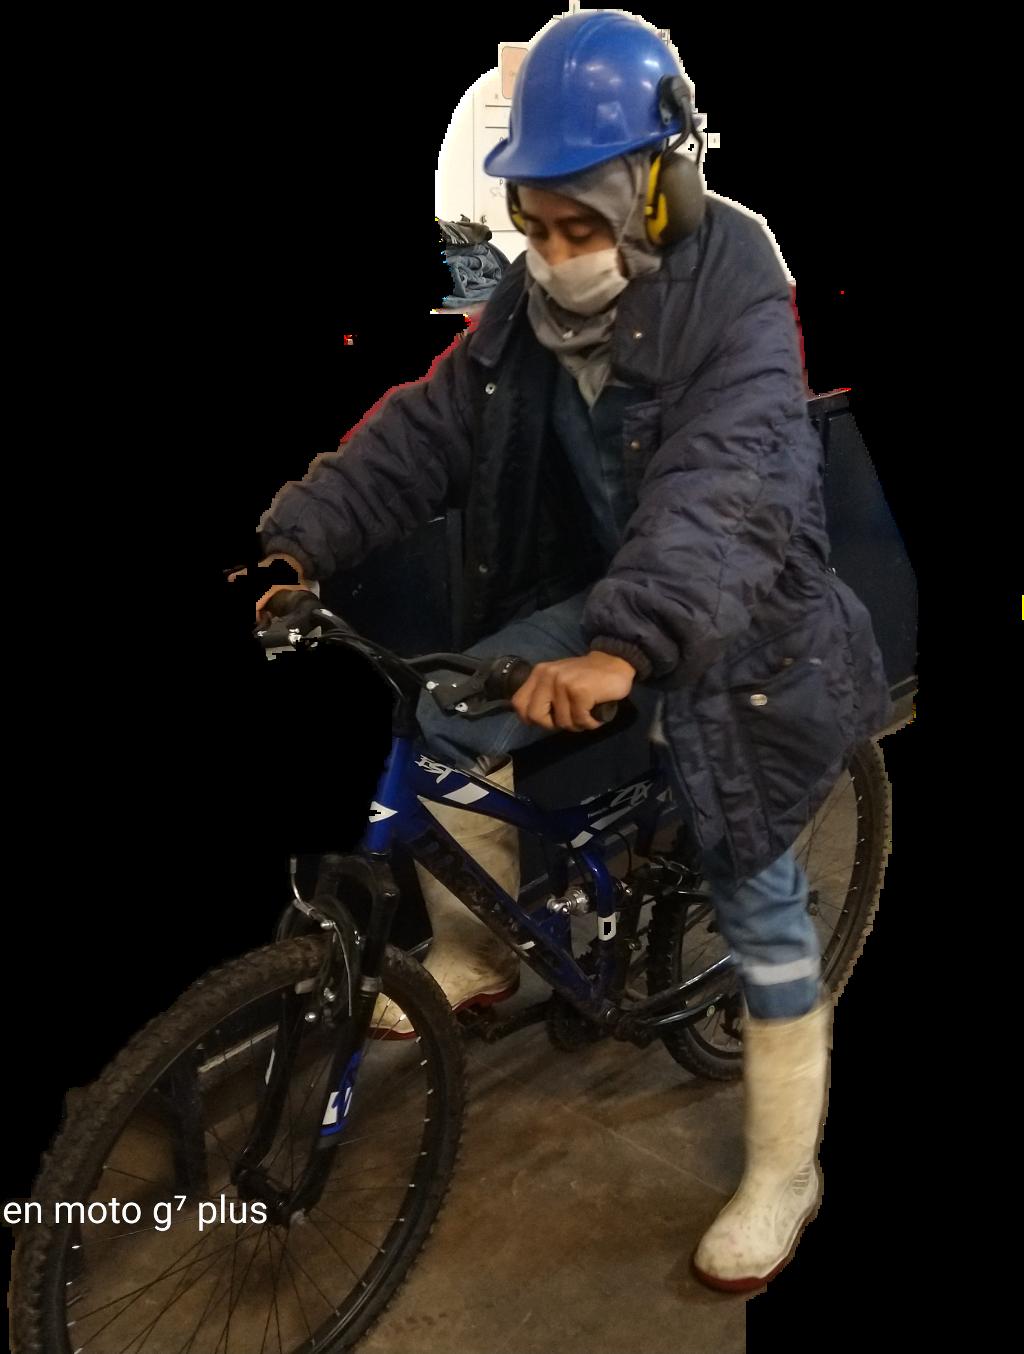 #bici